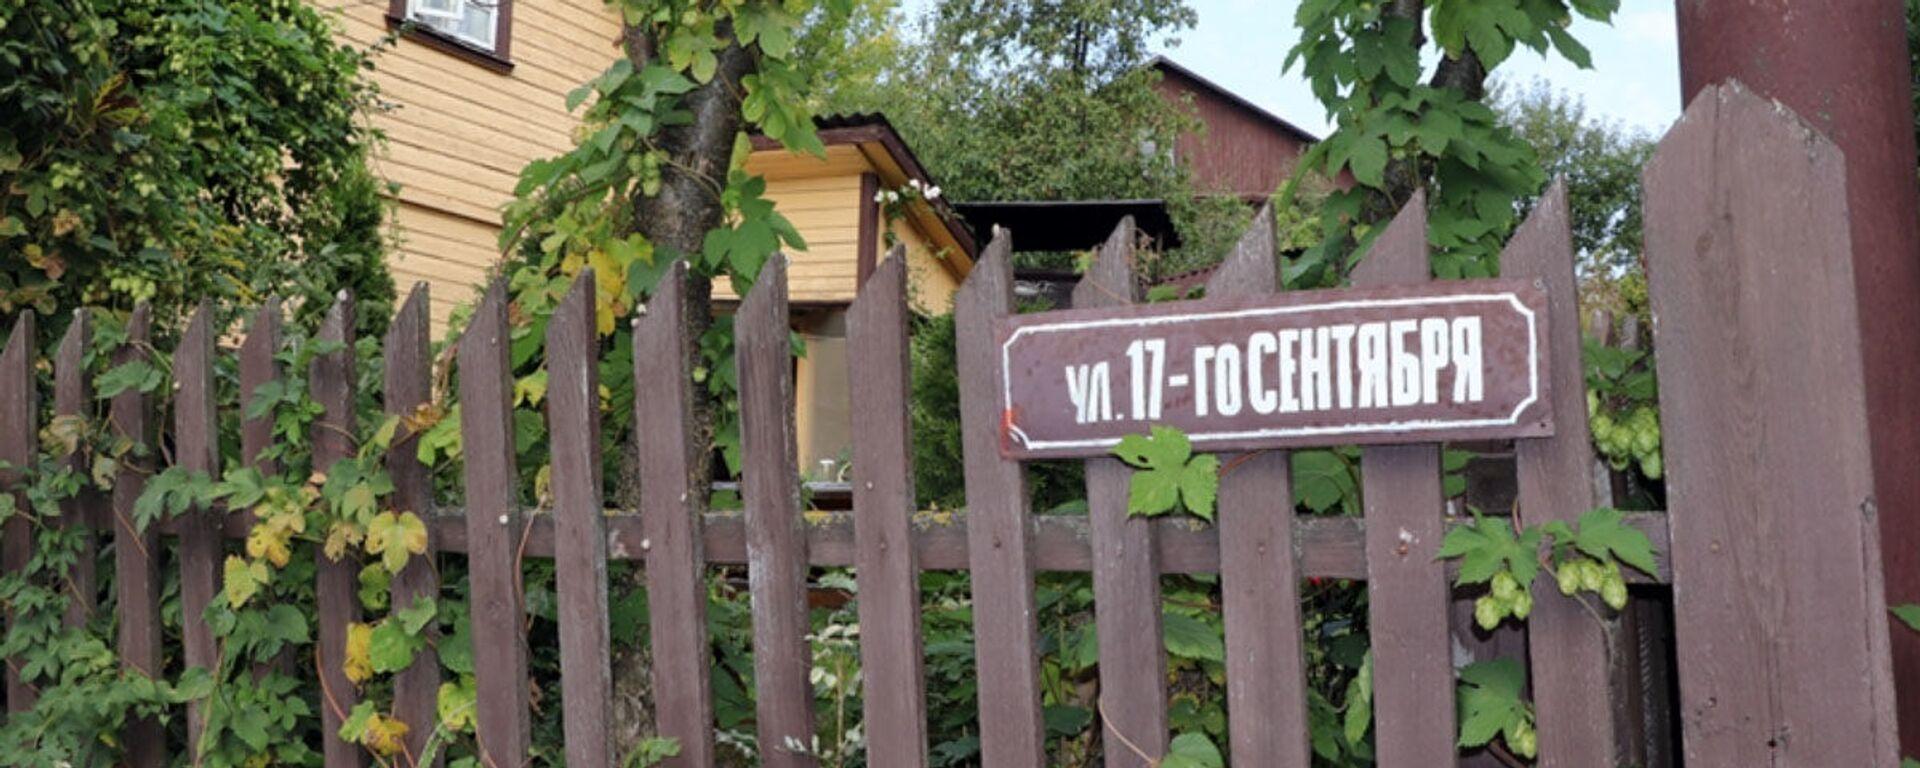 Улица 17 сентября в Гродно - Sputnik Беларусь, 1920, 17.09.2021